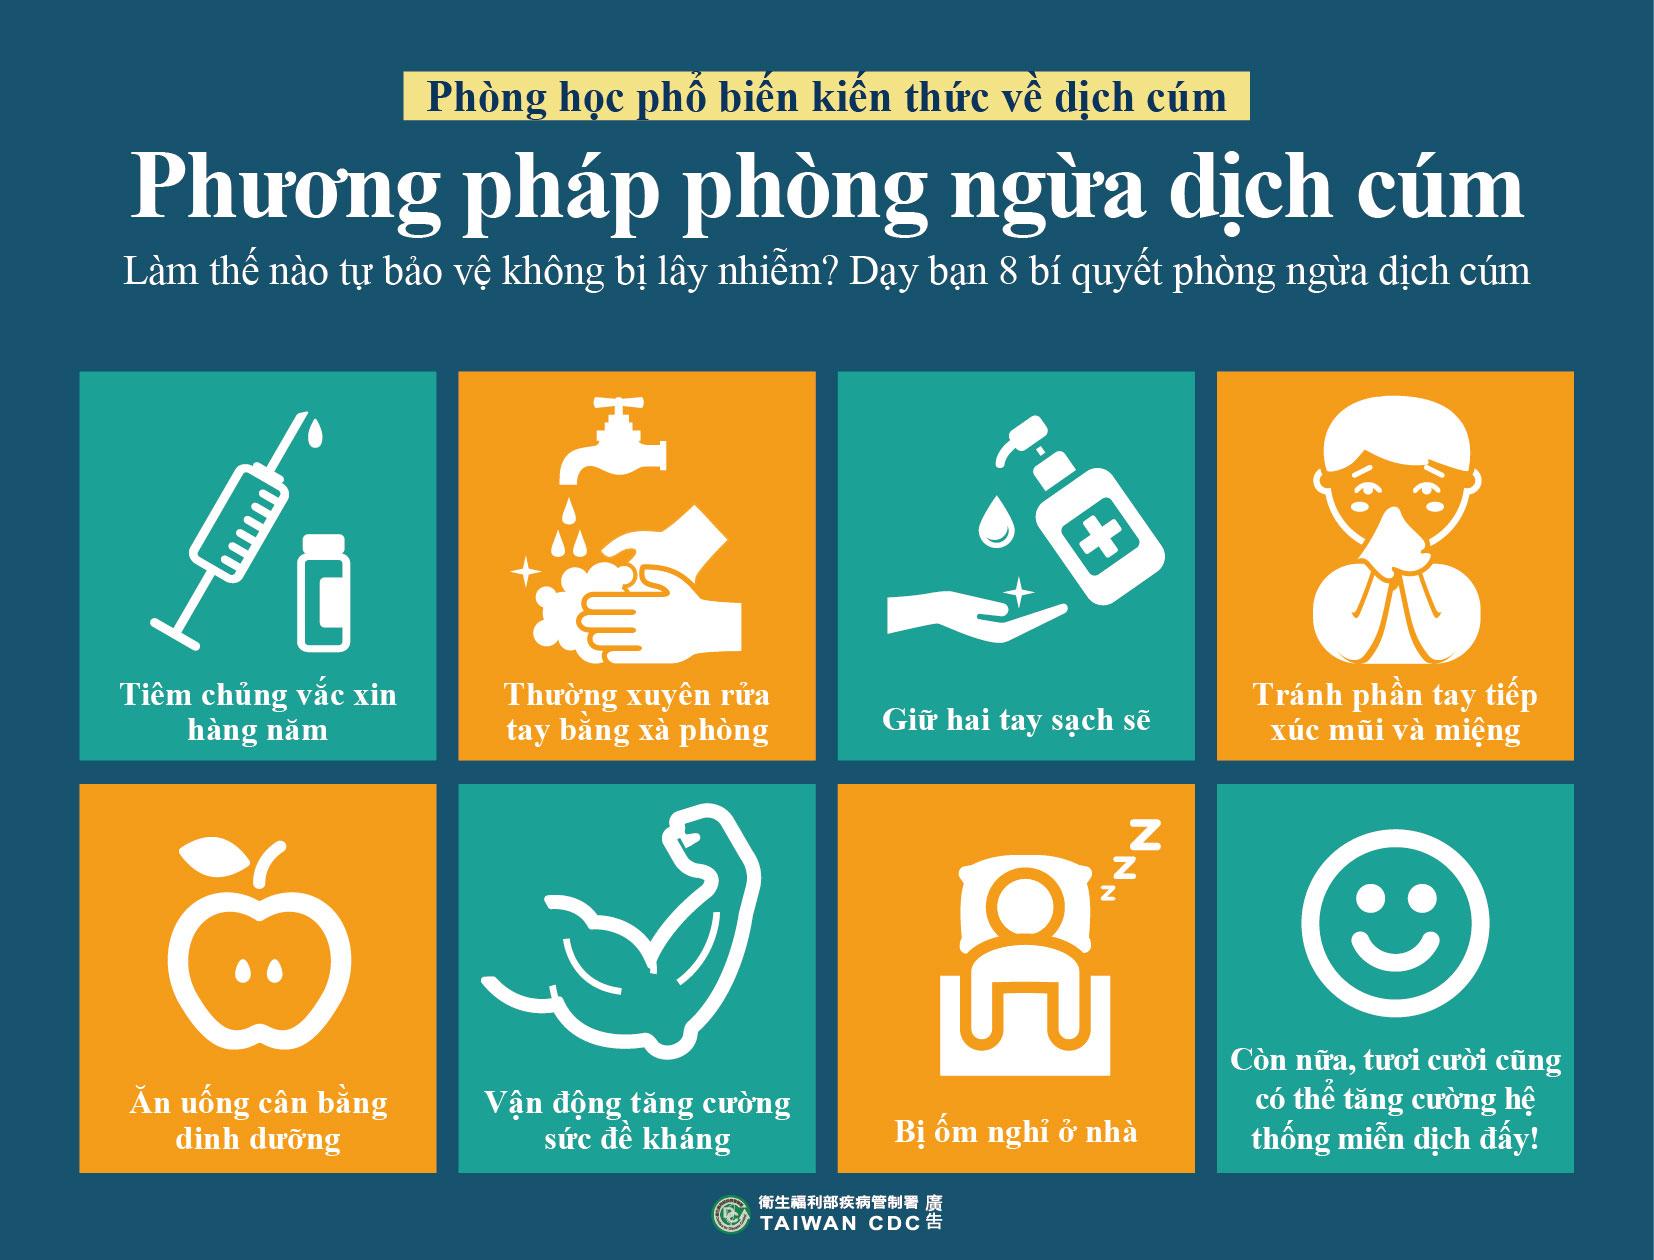 詳如附件【nhấp vào đây】Phương pháp phòng ngừa dịch cúm流感的預防方法(越文)